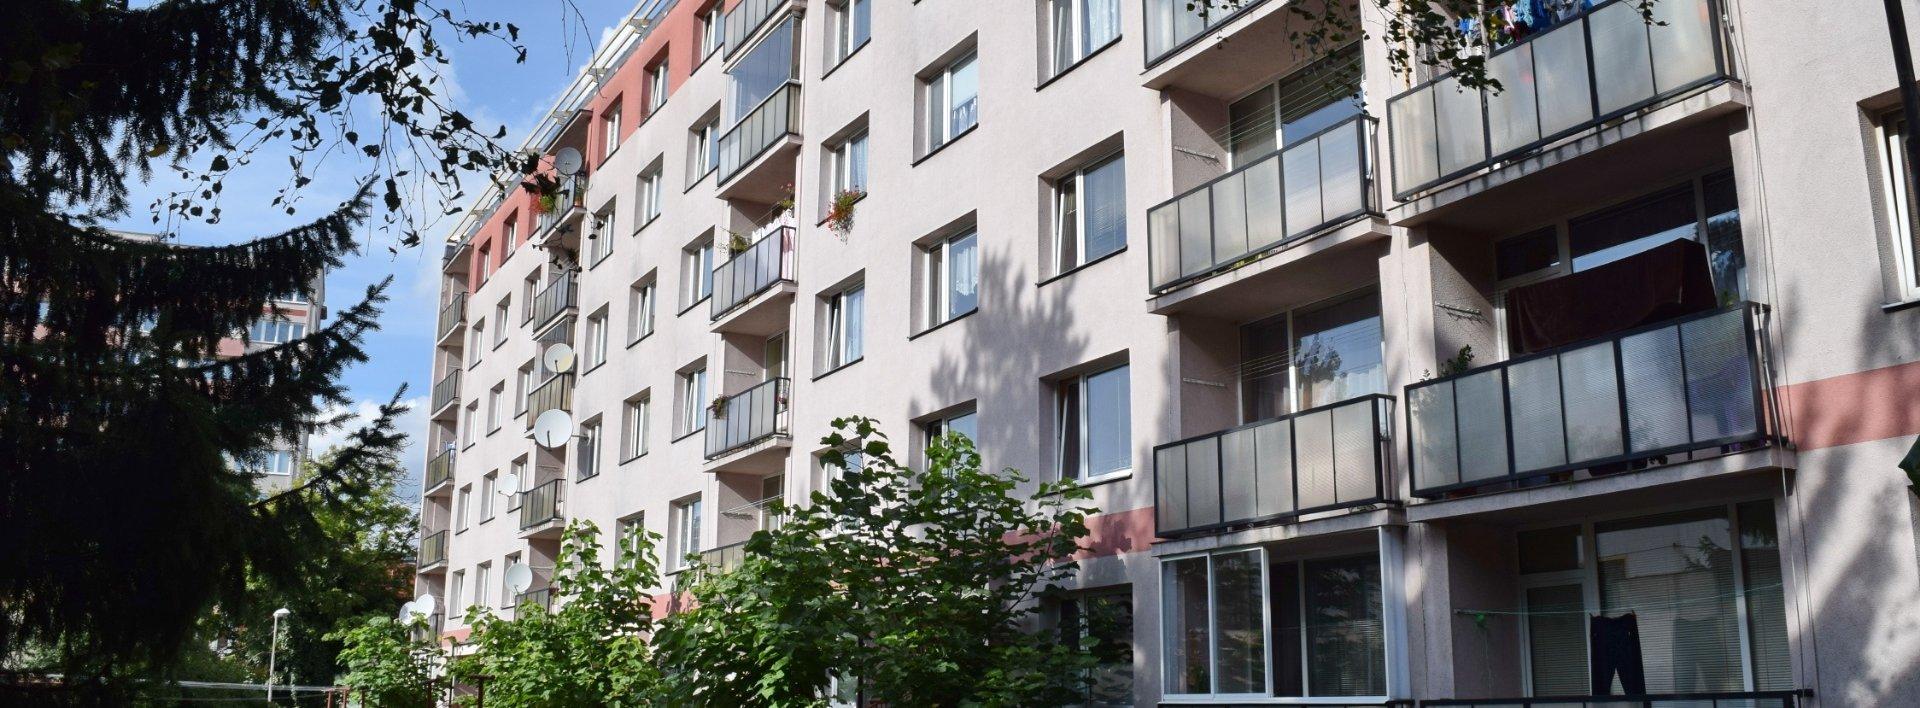 Prodej slunného útulného bytu 2+kk, 37 m², Ev.č.: N48952